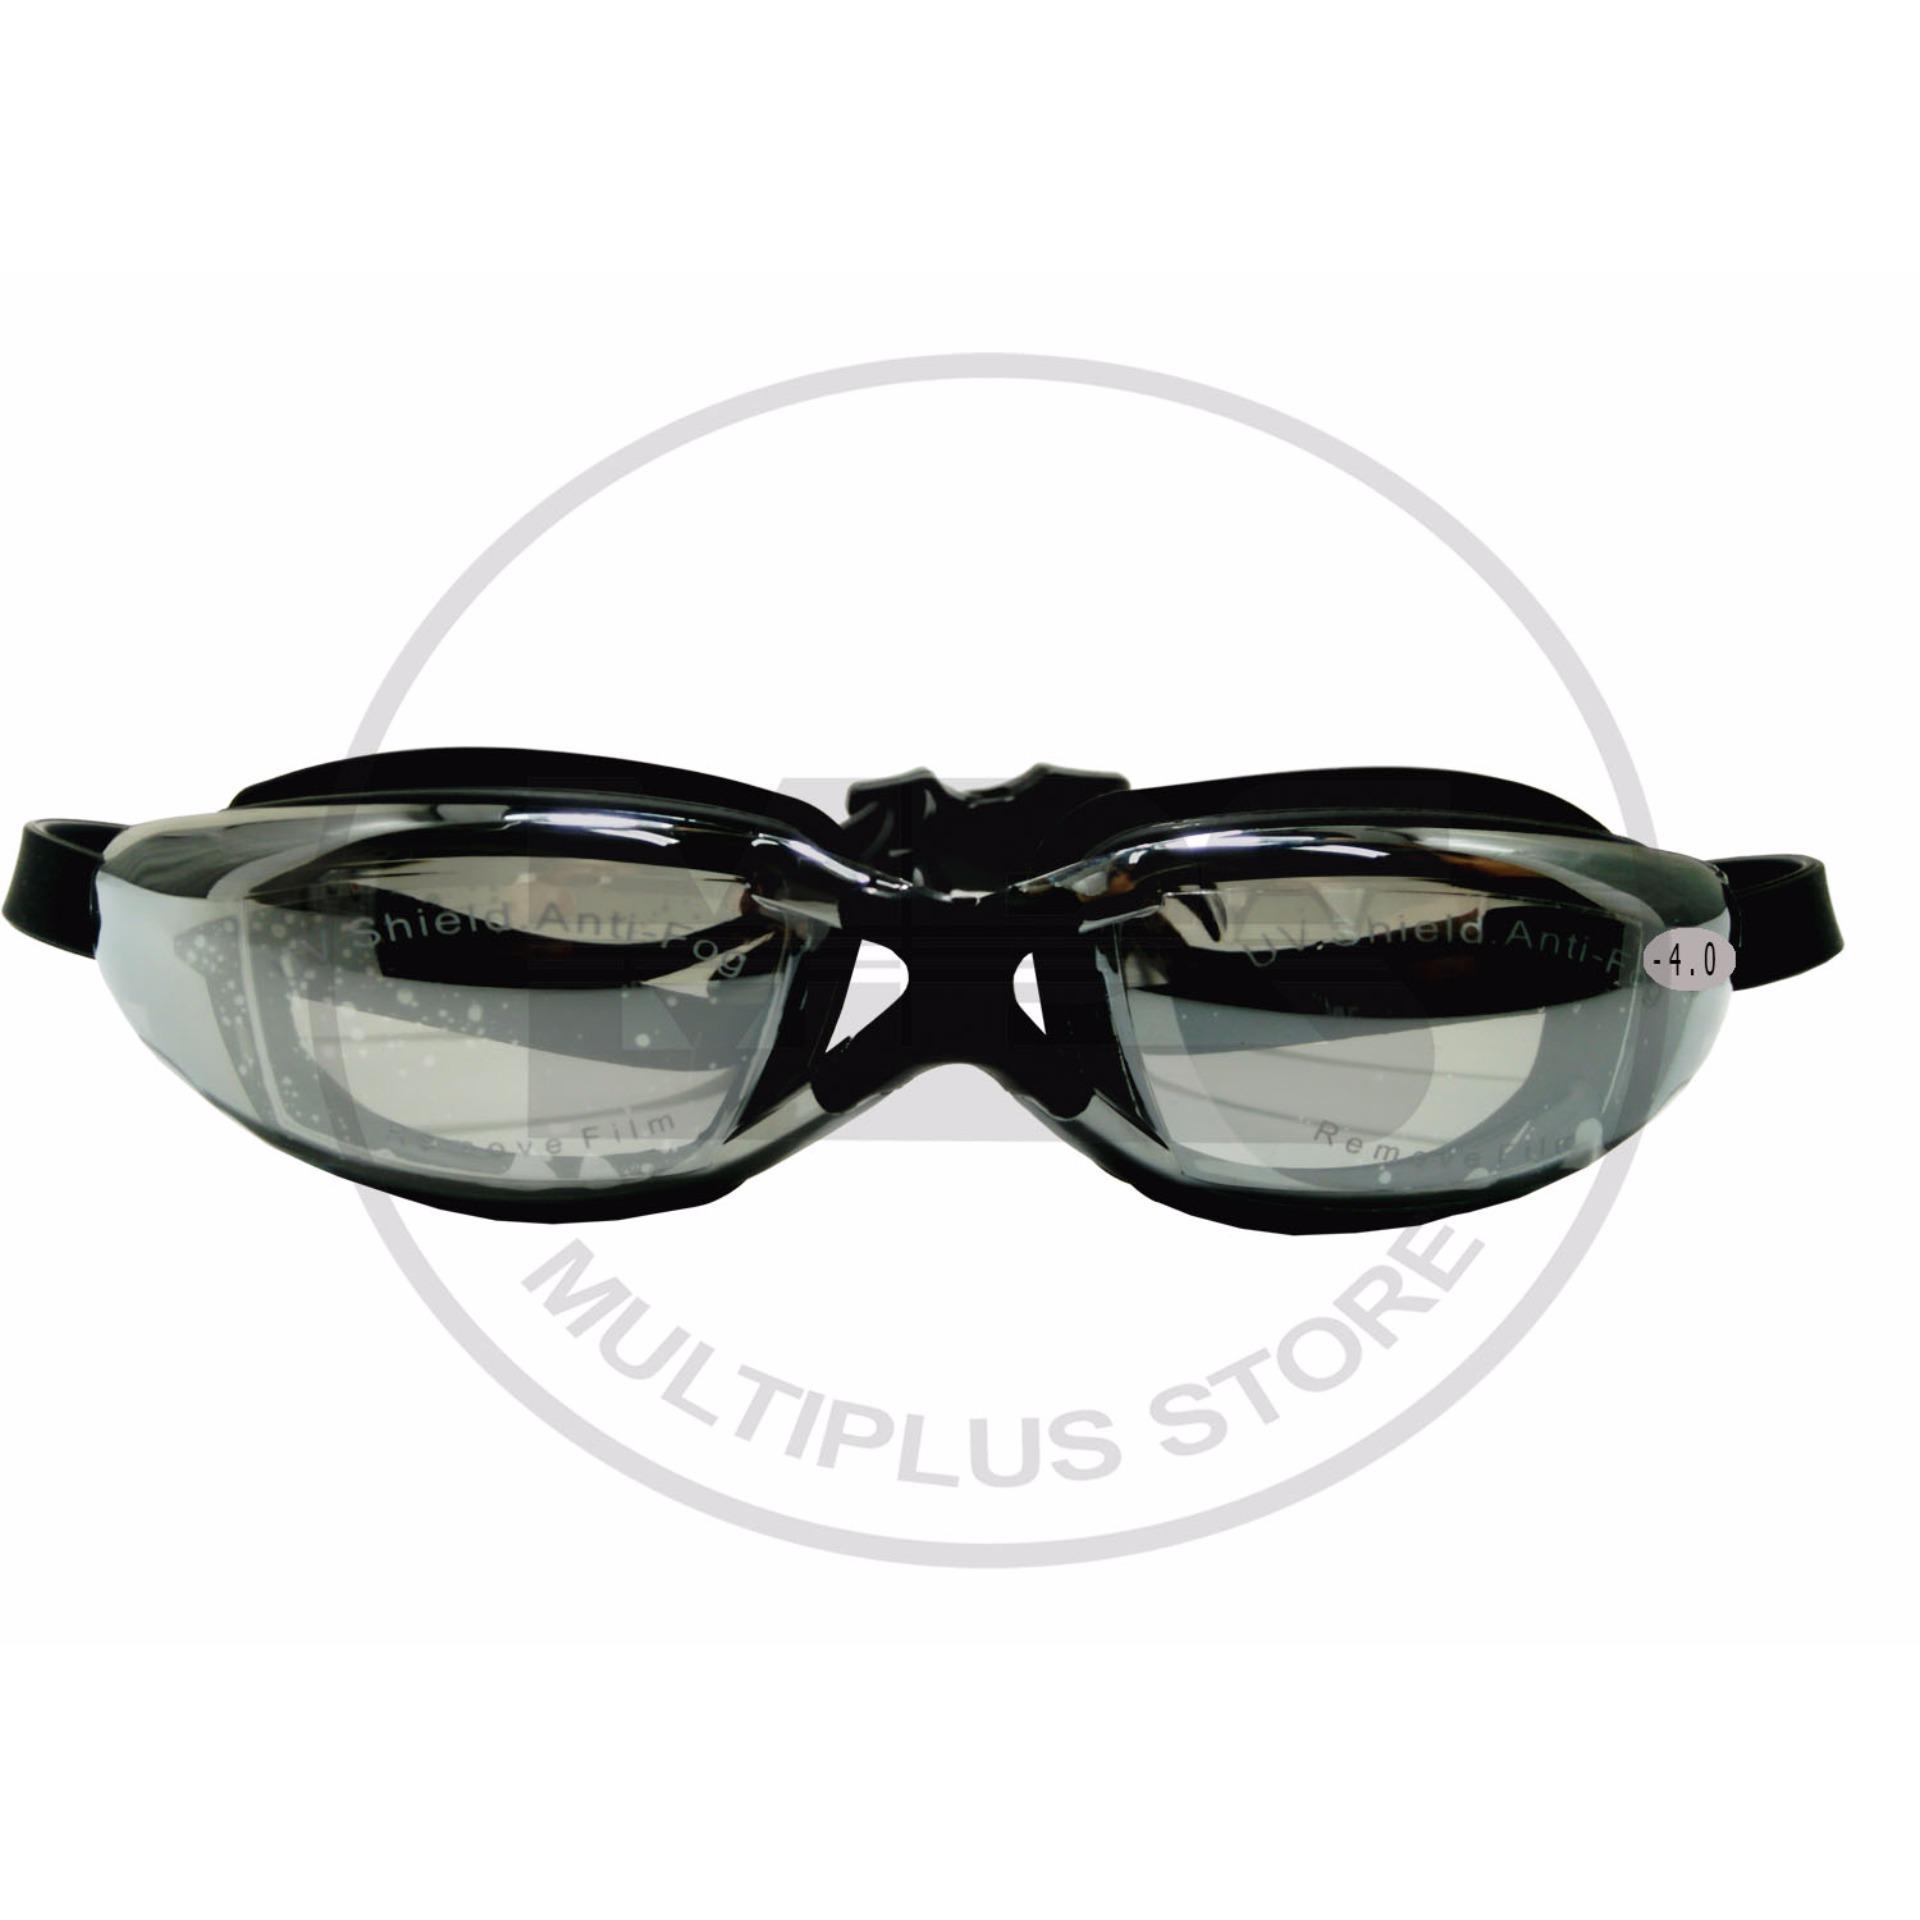 Speedo OPT9200 Kacamata Renang Minus -4.5